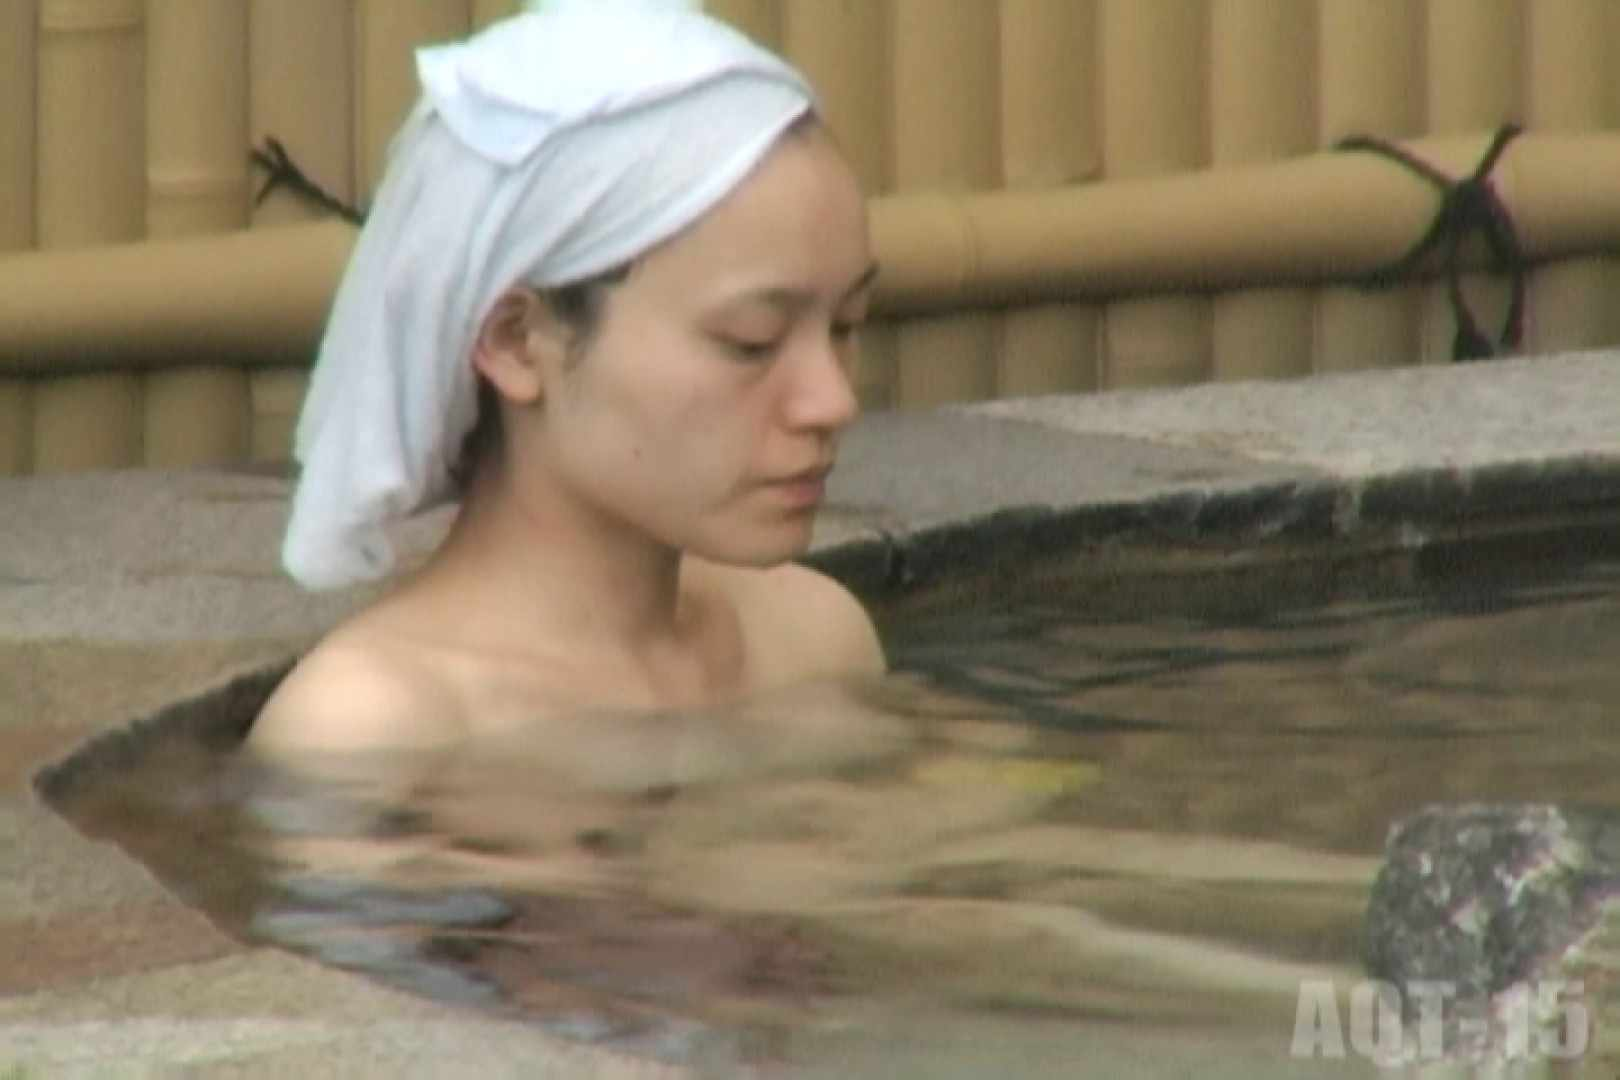 Aquaな露天風呂Vol.836 OLのエロ生活 オメコ動画キャプチャ 101連発 41